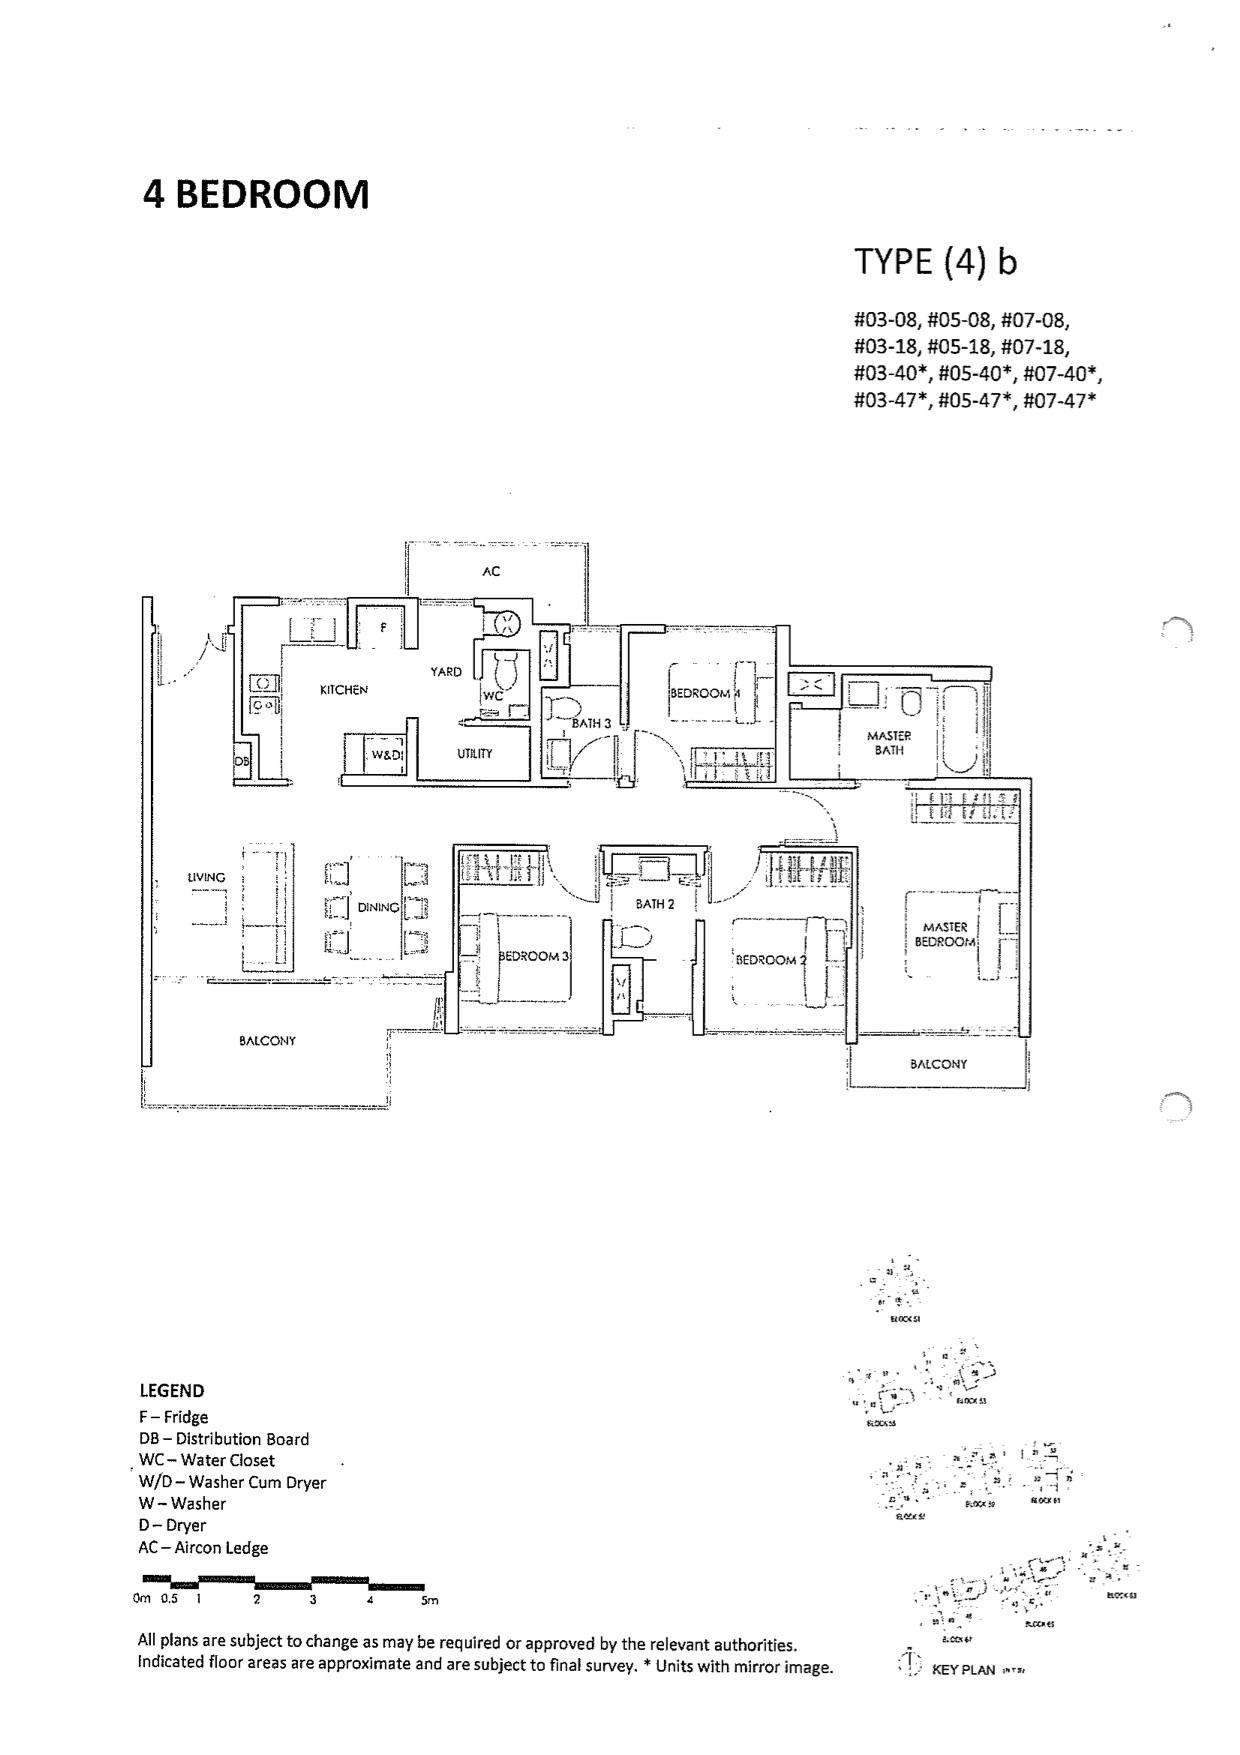 Inflora @ Pasir Ris :: Condo Floor Plan Layout :: 4 Bedrooms